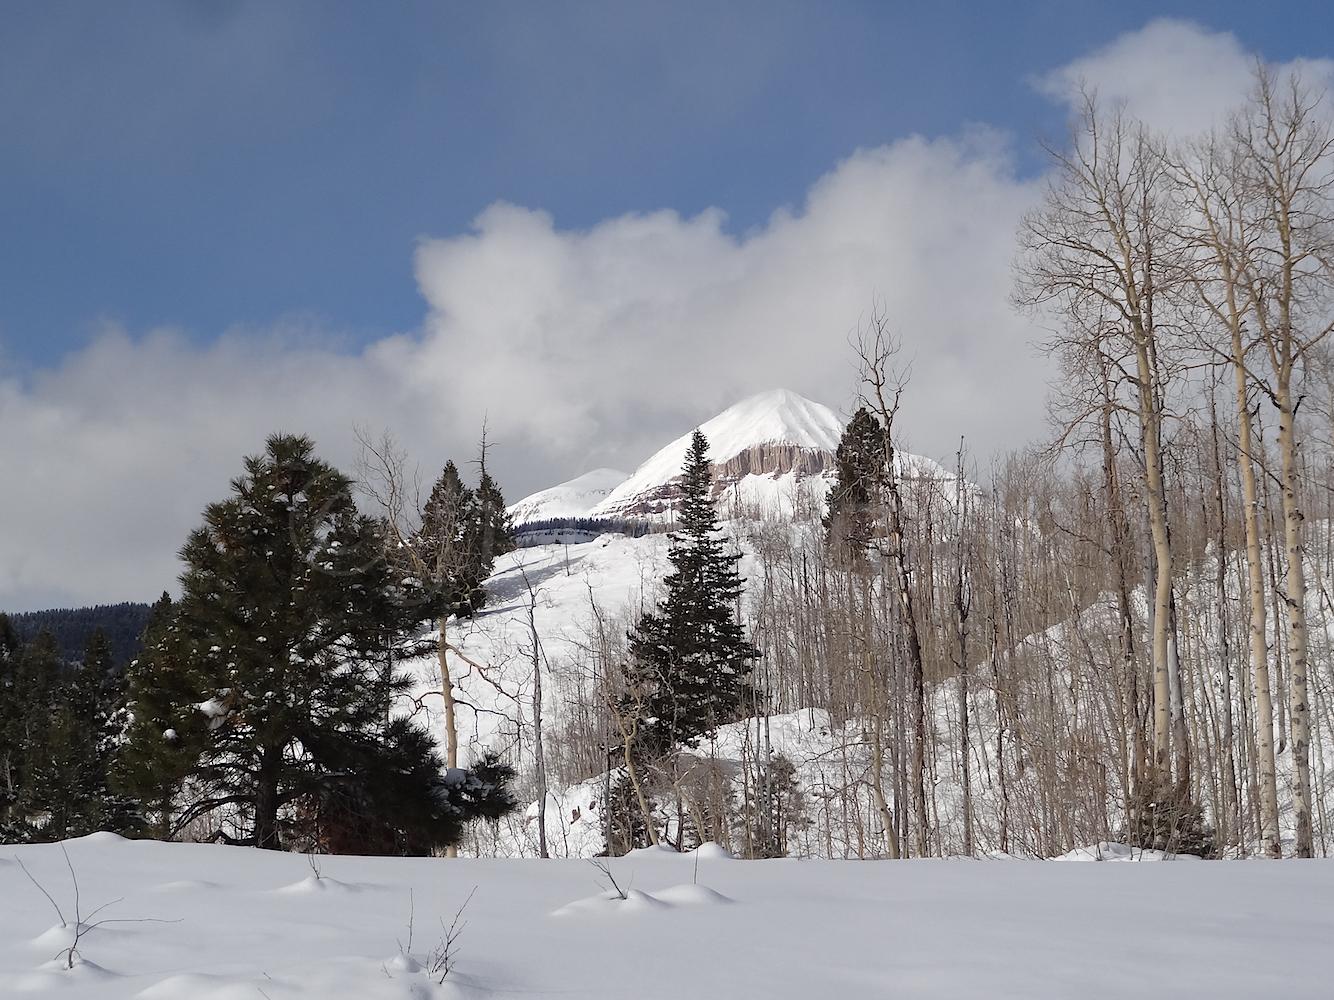 Lime Creek Road Snowshoe, Image #5350